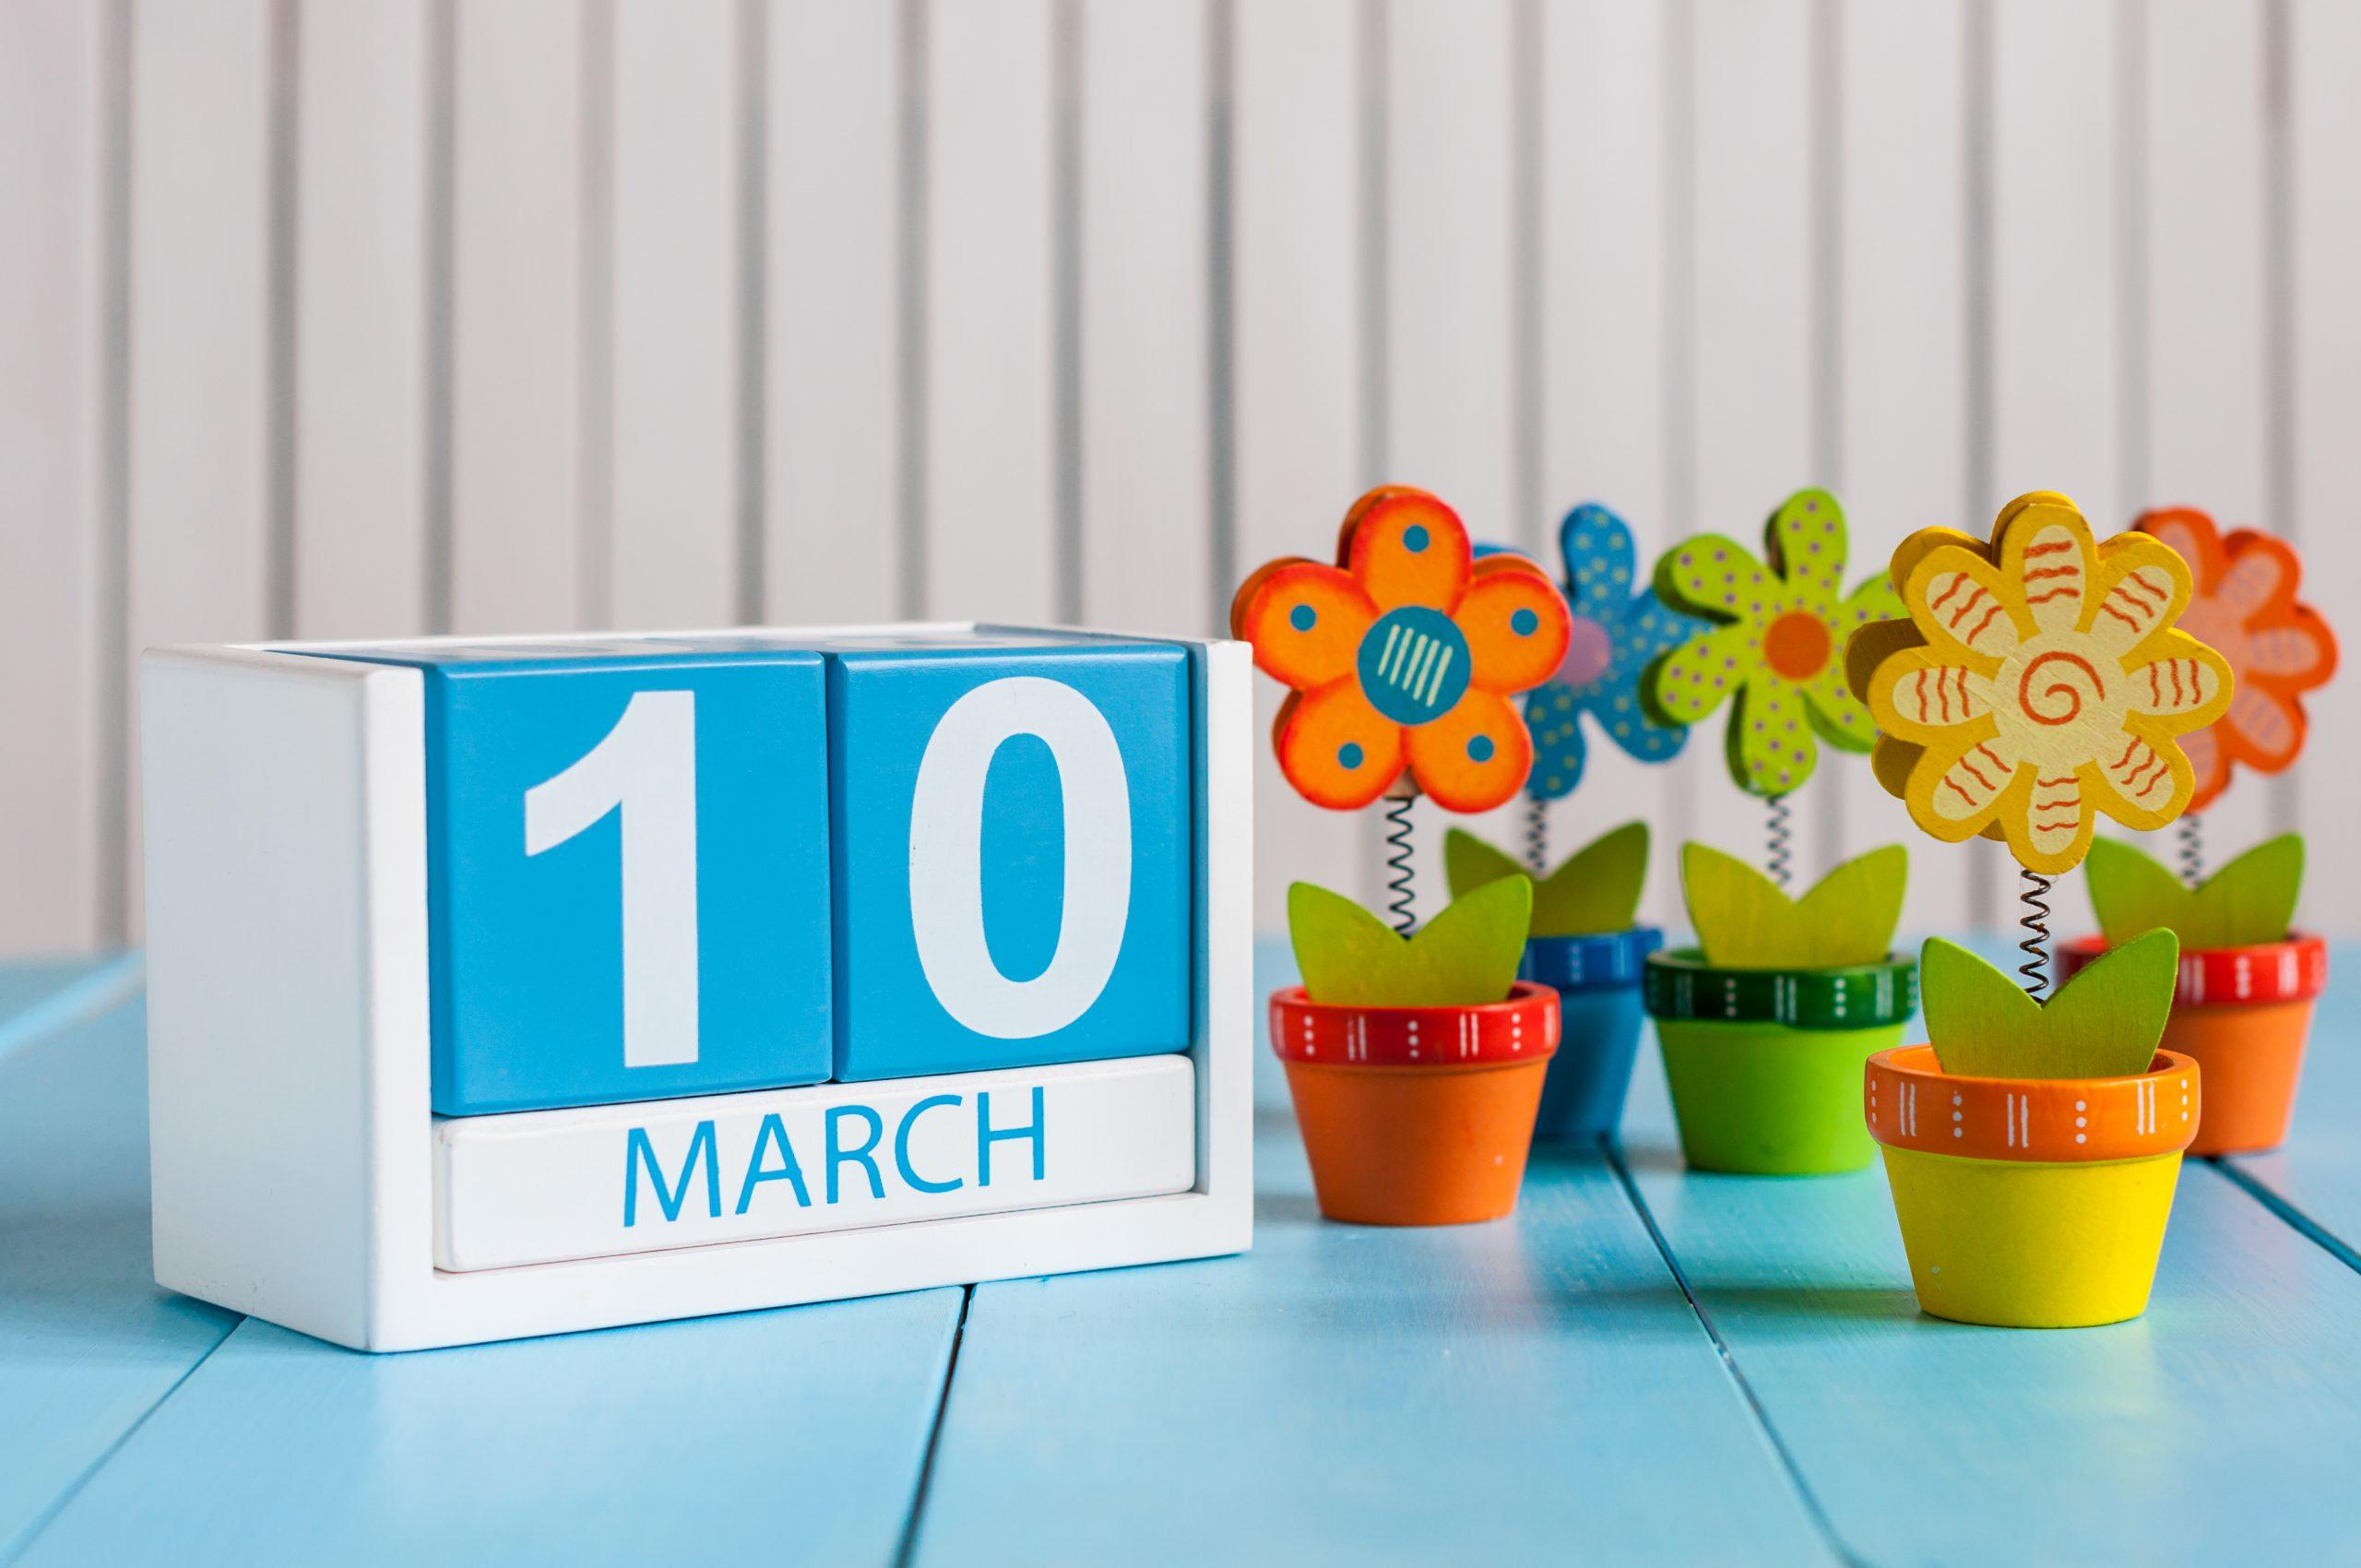 March 10 calendar day